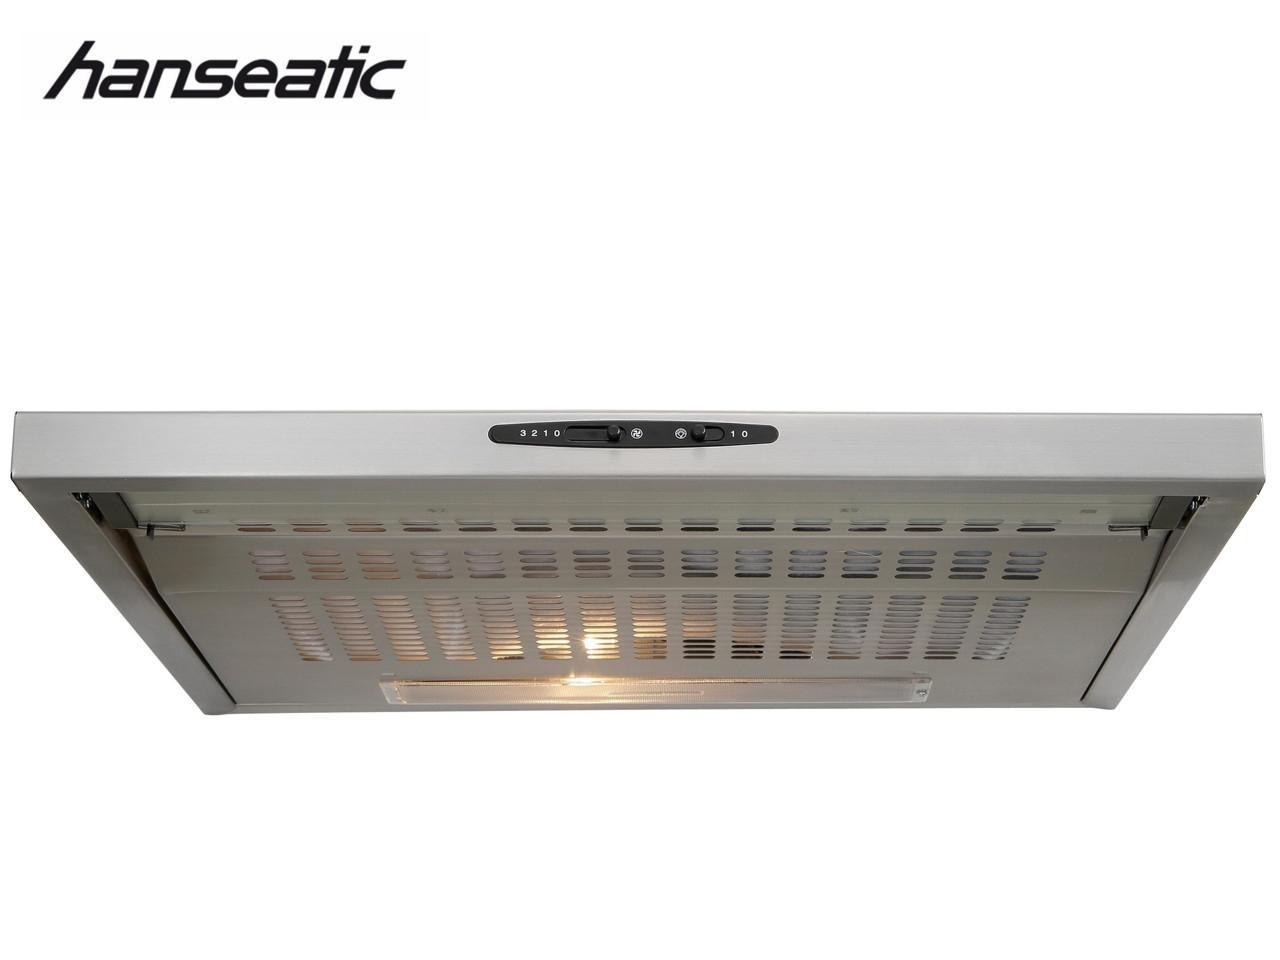 HANSEATIC SY-6001B1-P28-S12-600 | CHAT on-line podpora PO-PÁ 8-22.00!!